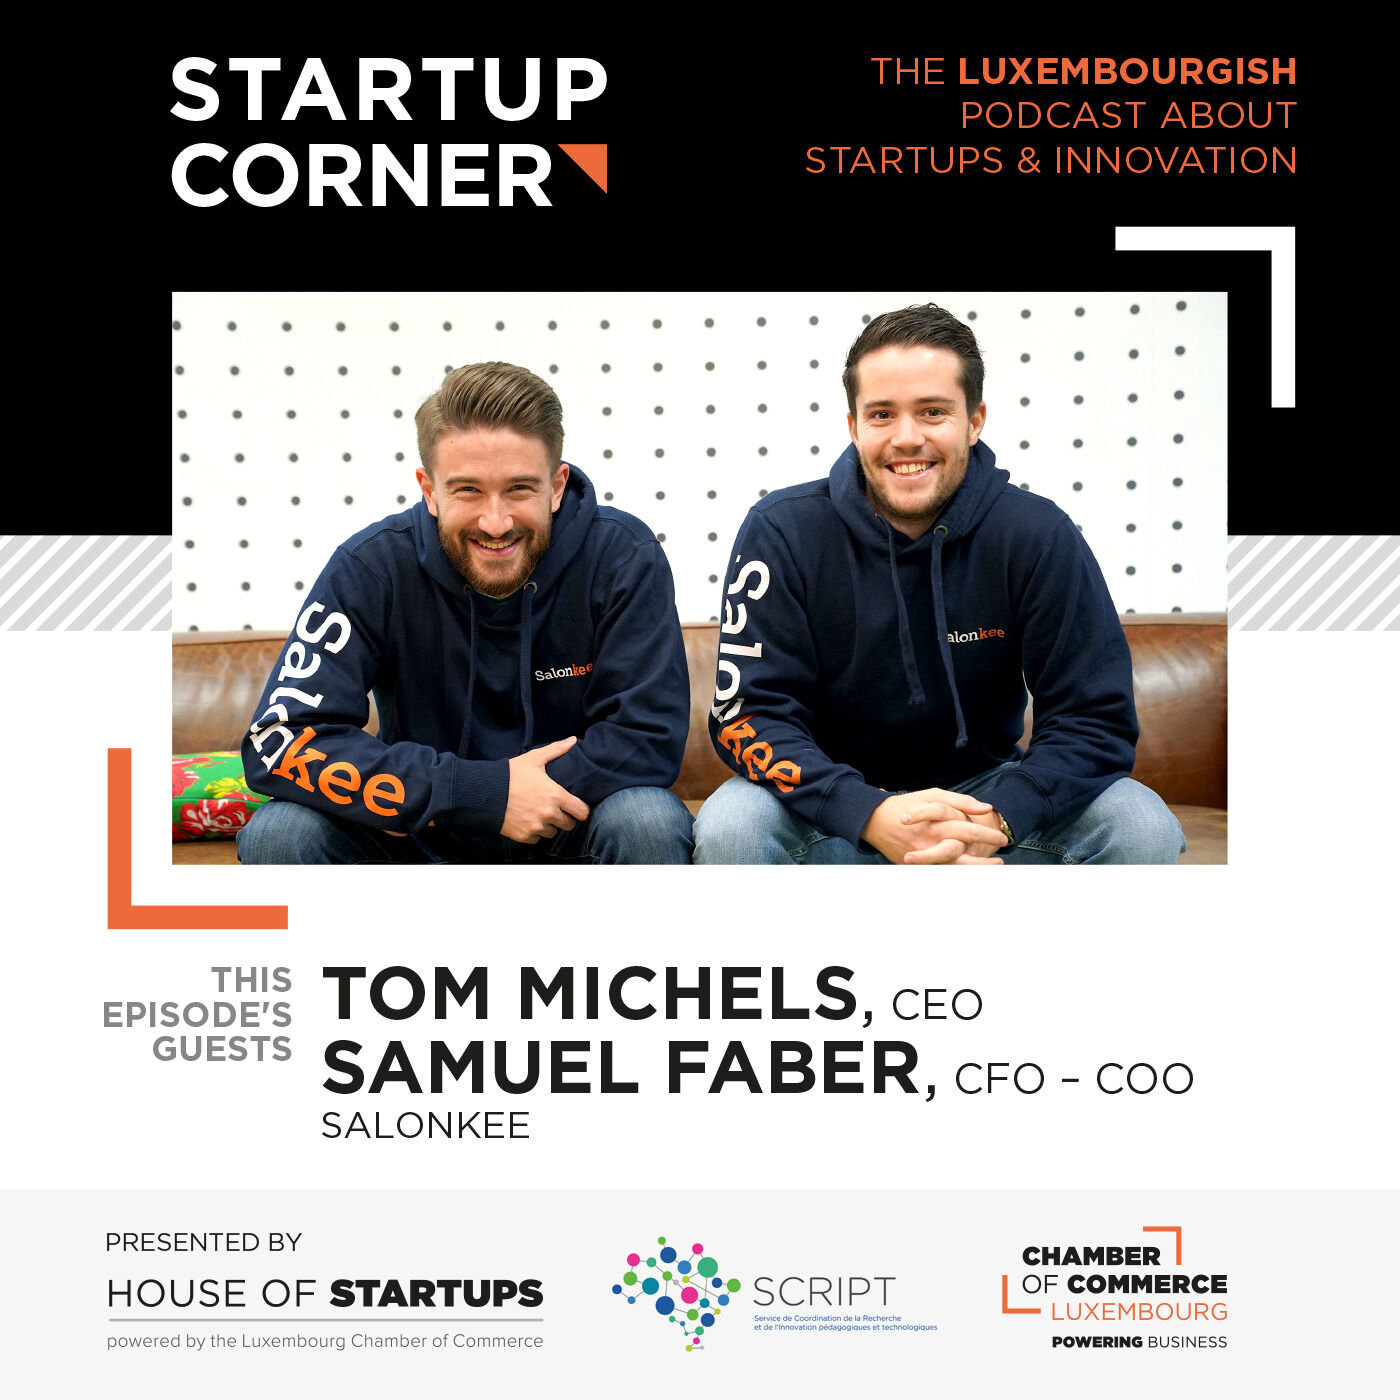 Startup Corner - Tom Michels & Samuel Faber - Salonkee